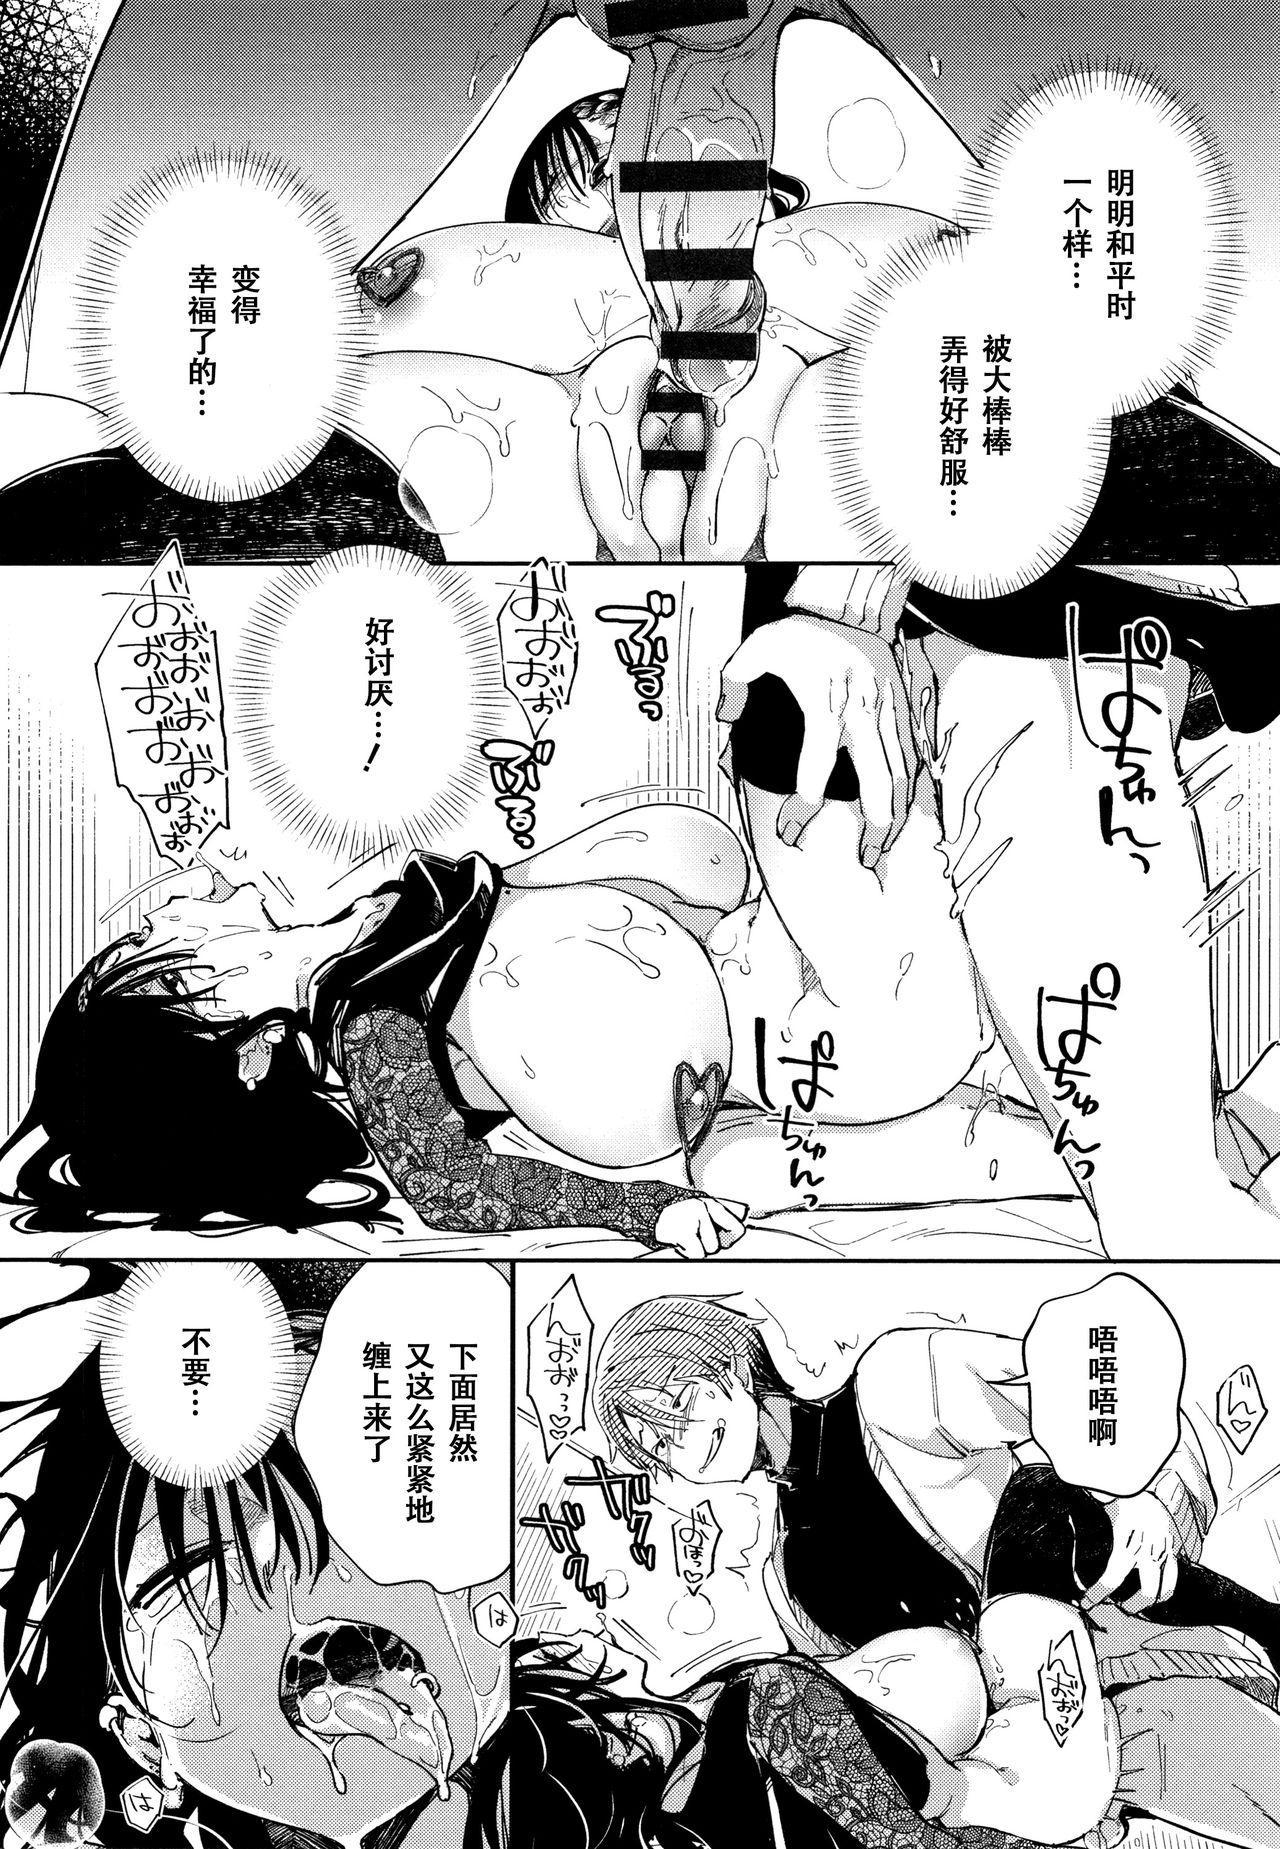 [Achumuchi] Saijaku Gal wa Ikizurai! - The weakest pussy is hard to go.ch.1-8 [Chinese] [战栗的玻璃棒汉化] [Ongoing] 154